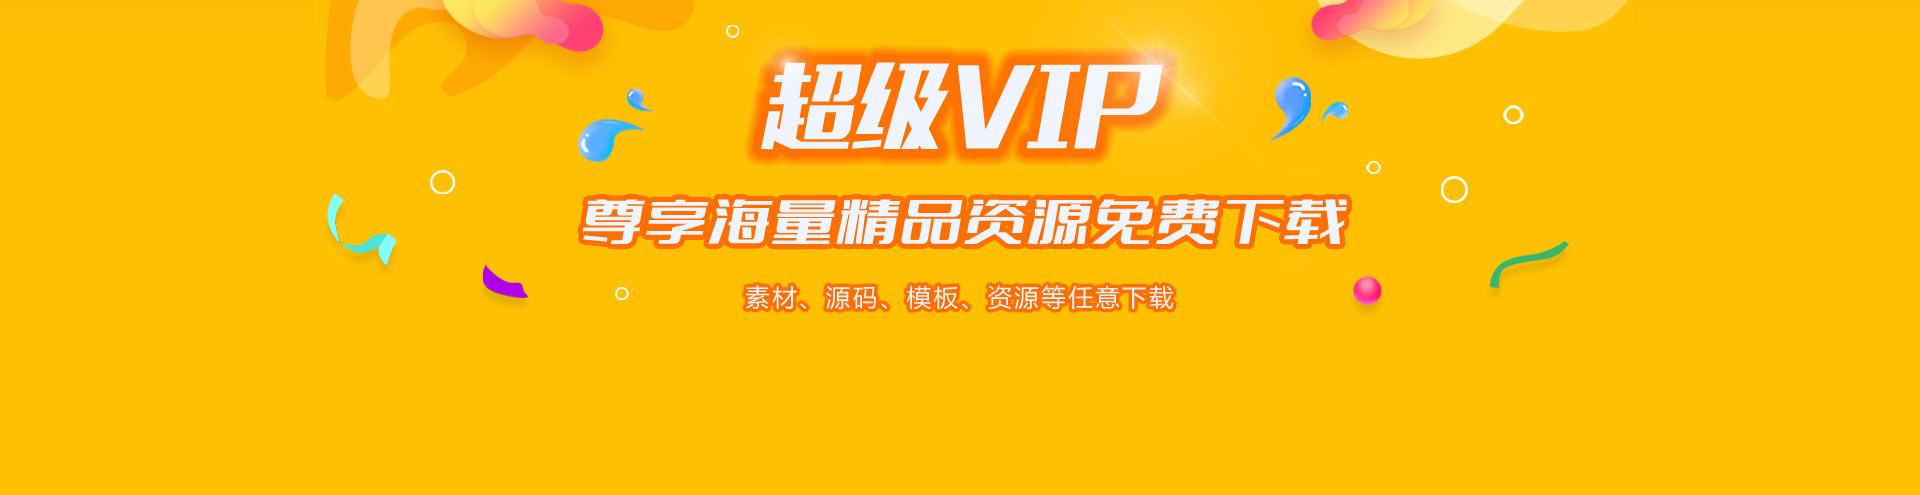 VIP介绍页面